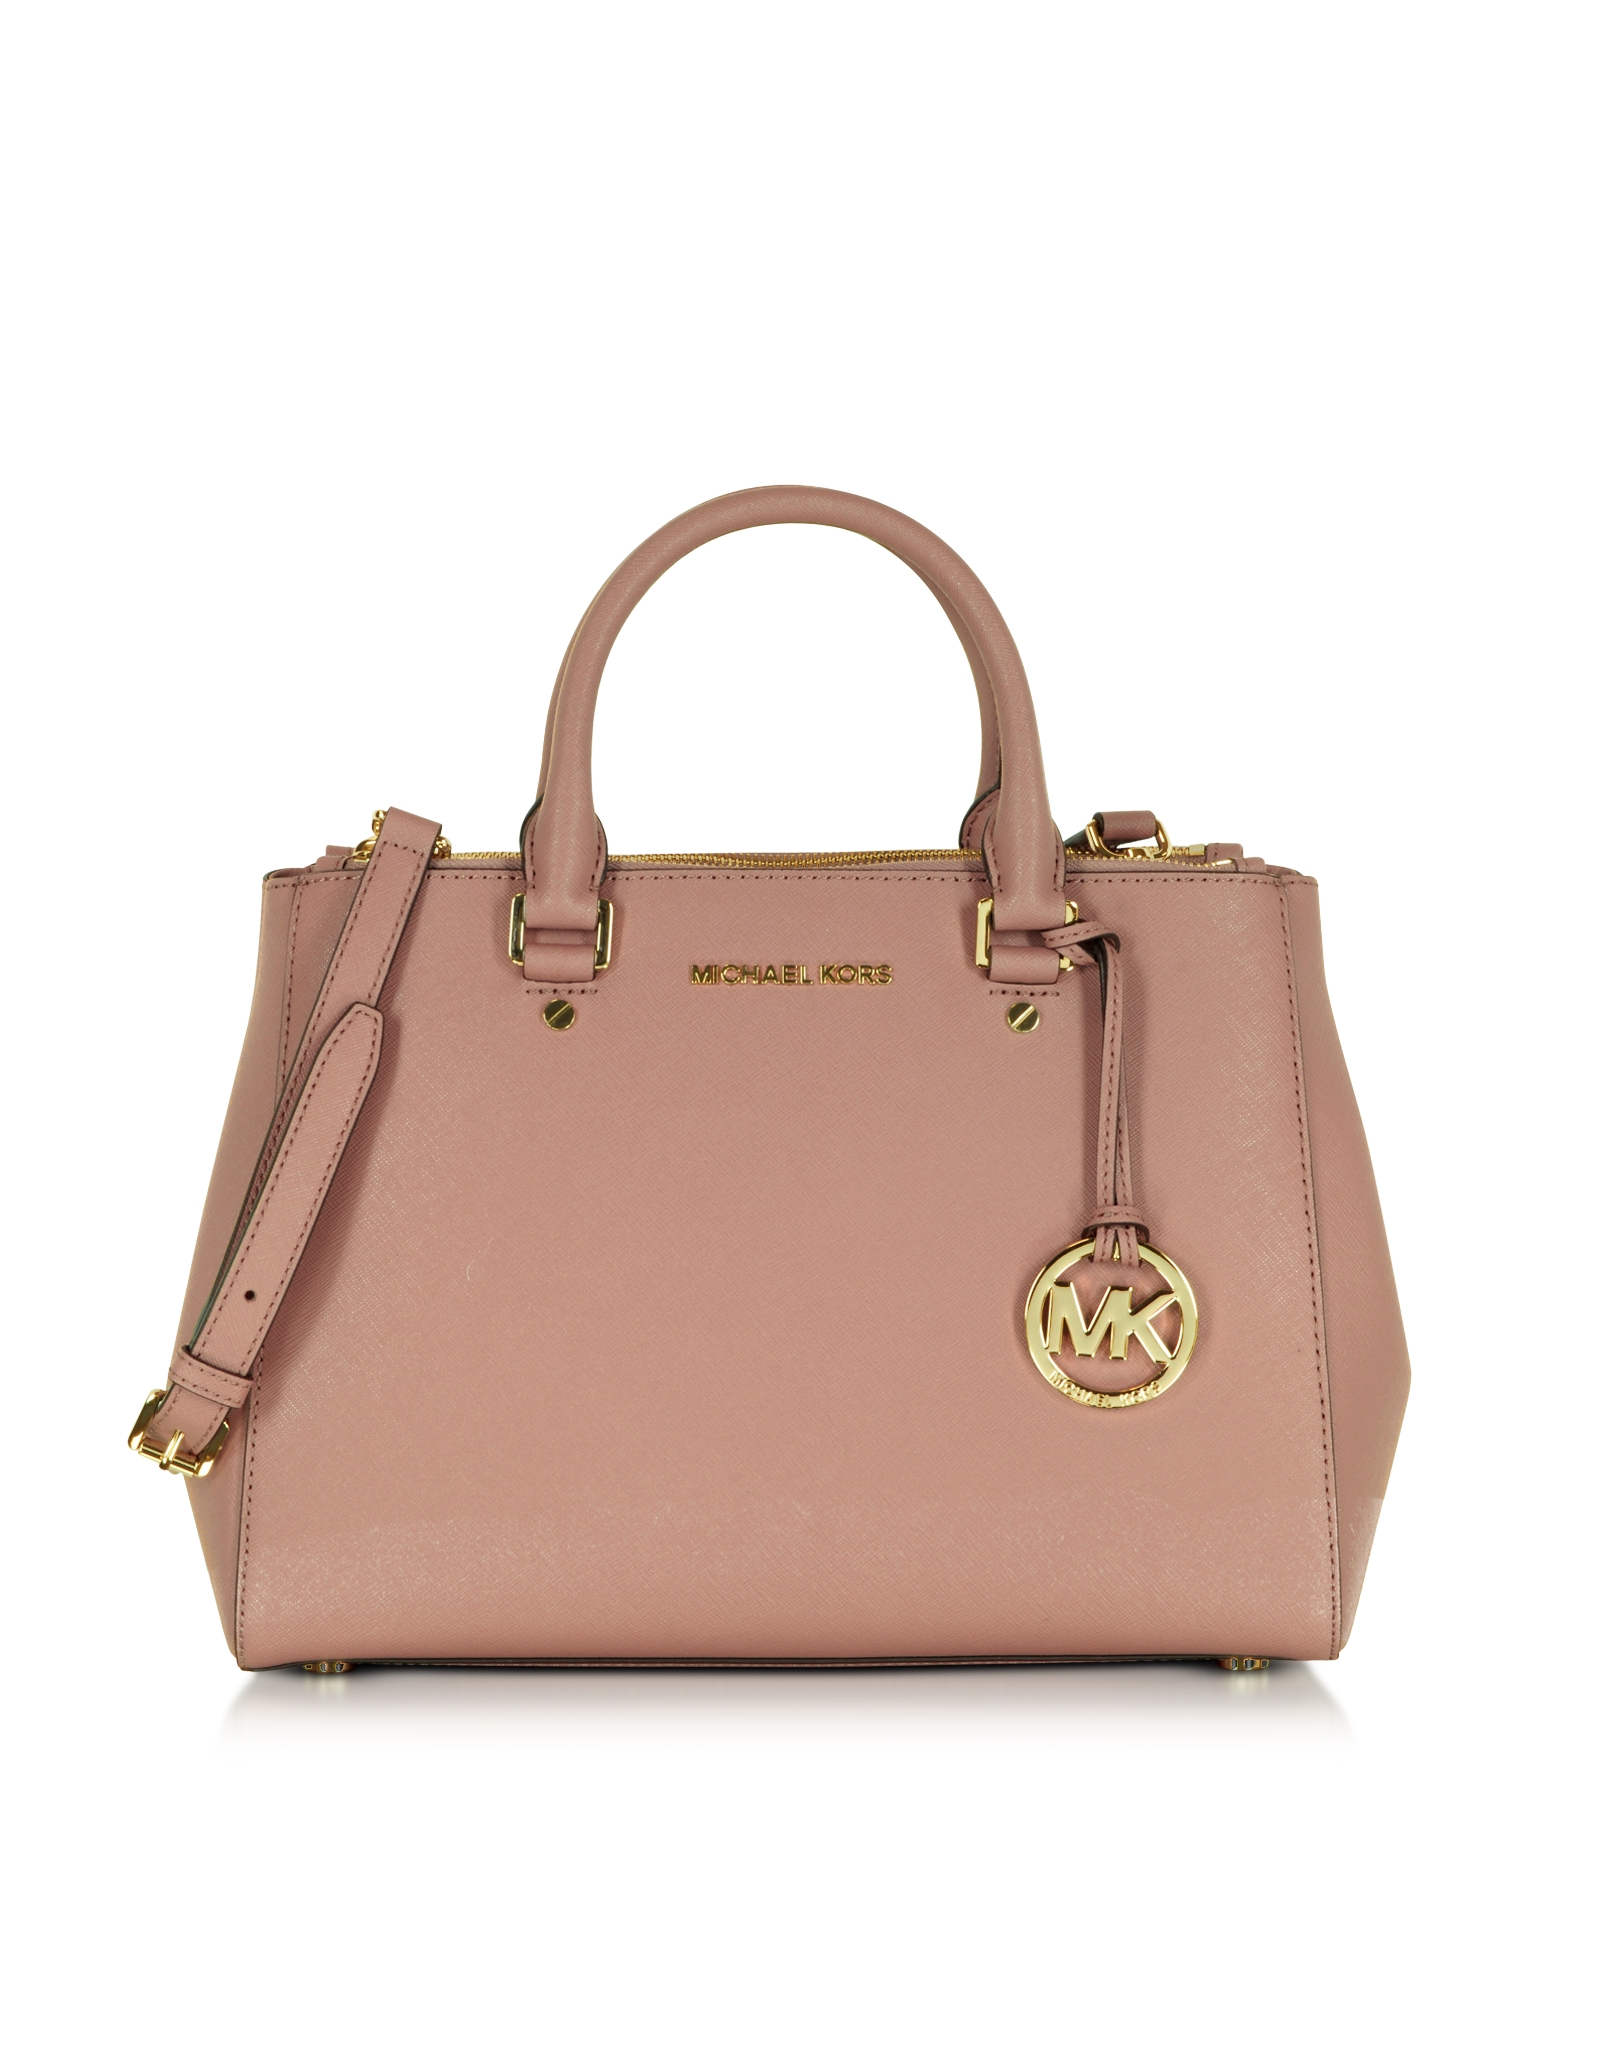 0fe3c19bc10afd Michael Kors Sutton Medium Saffiano Leather Satchel Bag in Pink - Lyst